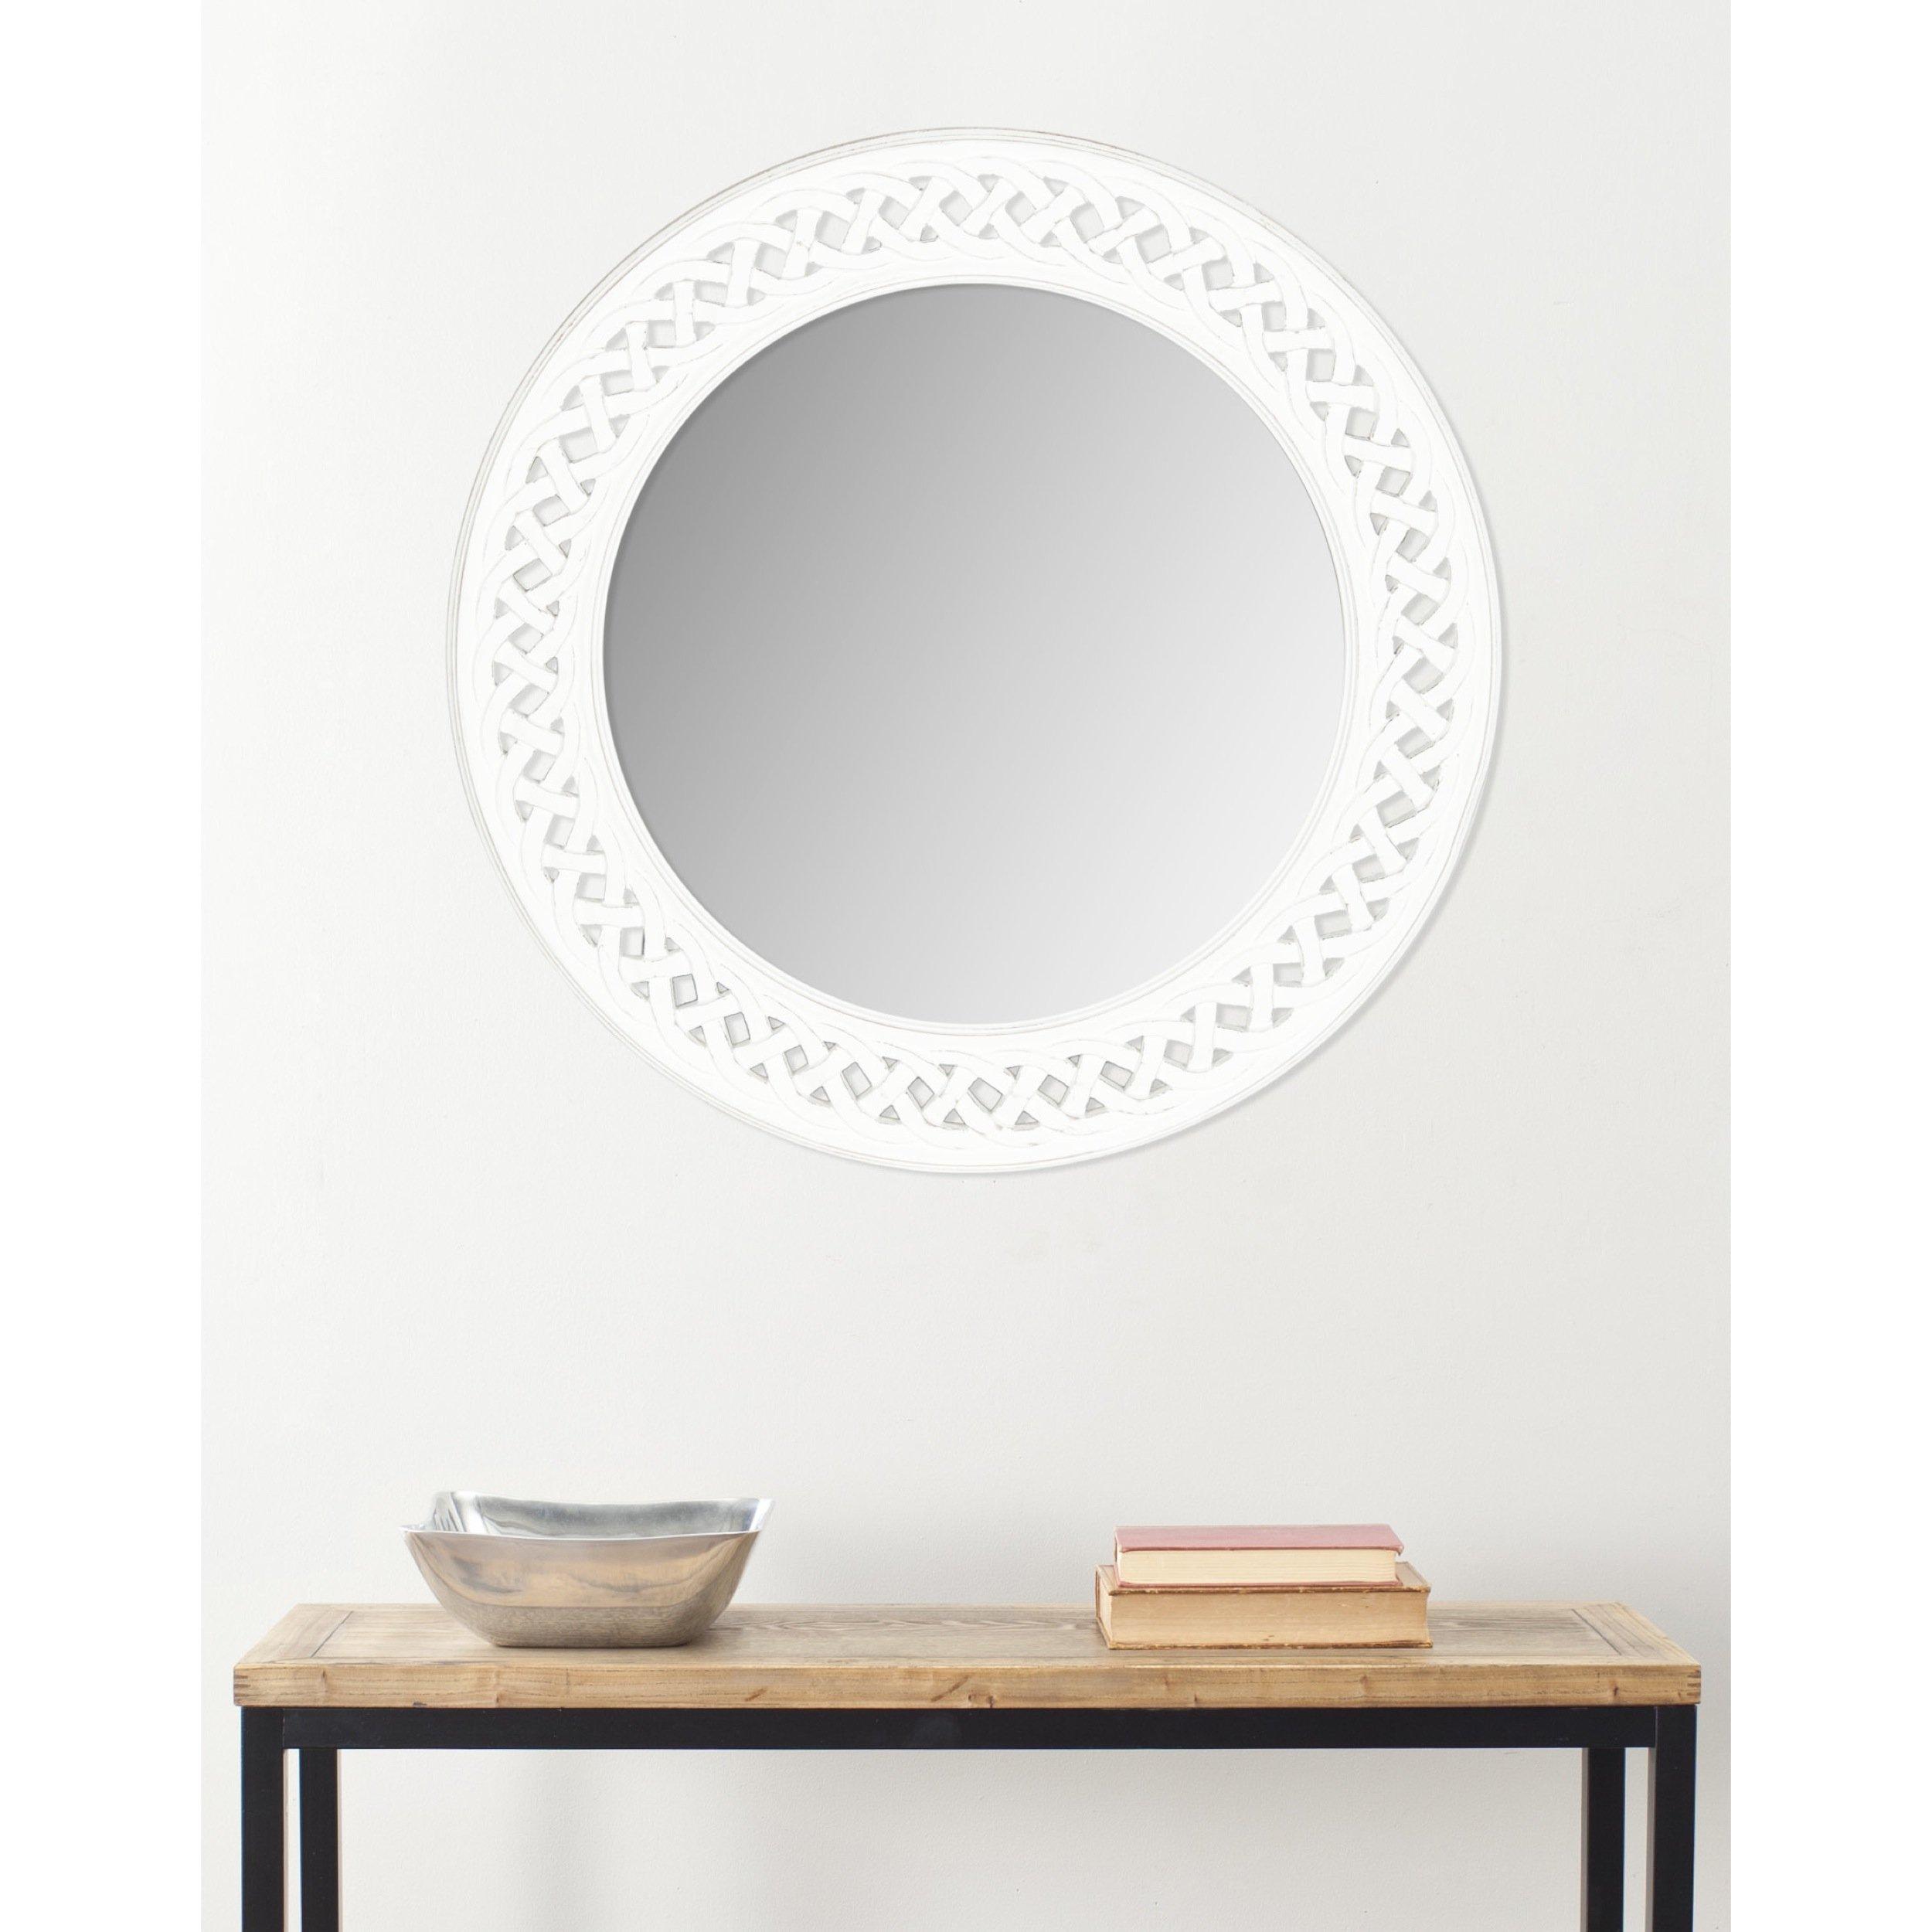 Safavieh Home Collection Braided Chain Mirror, White